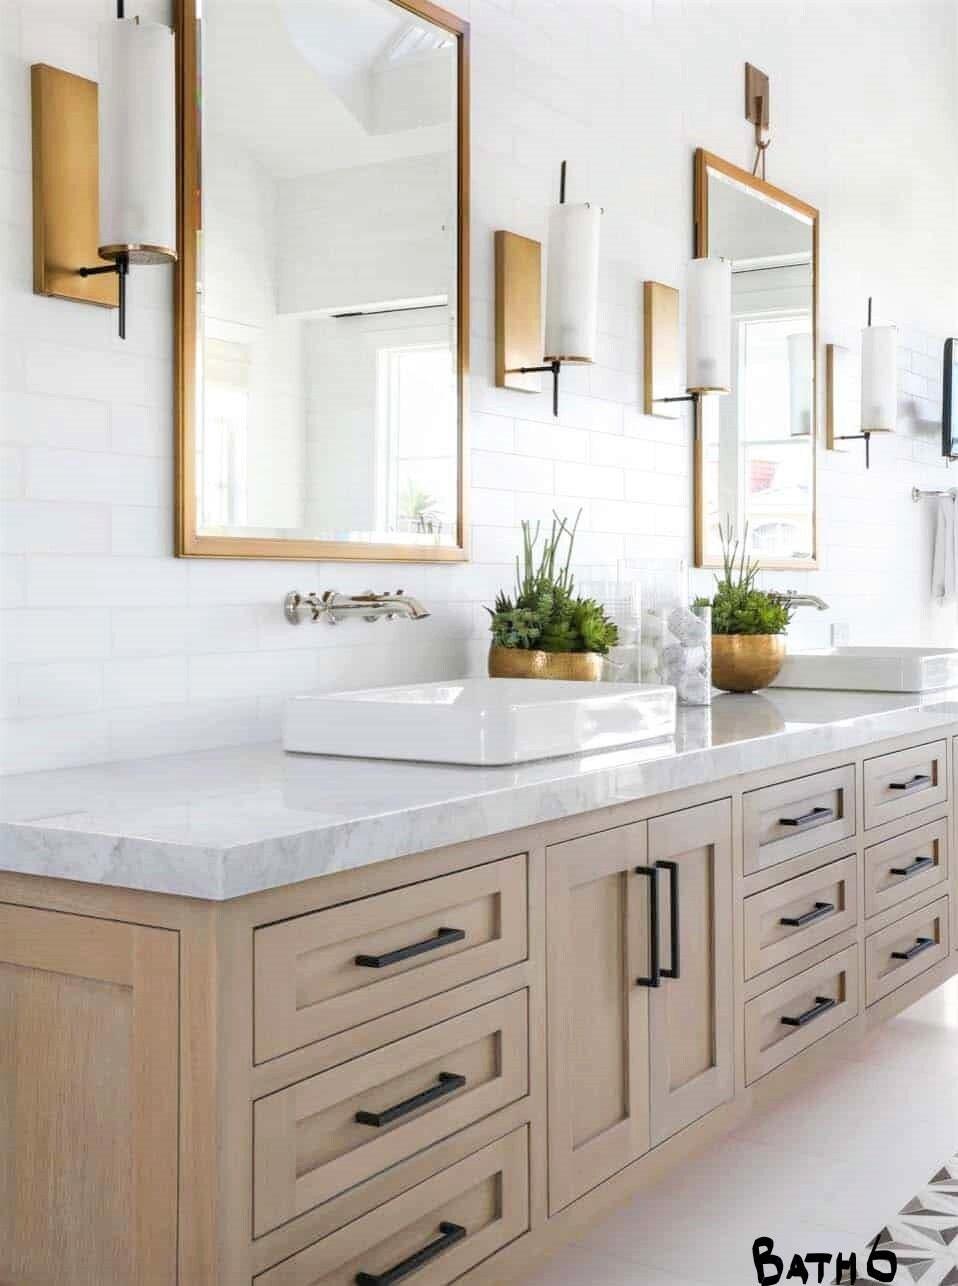 Bathroom Vanity Hair Tool Organizer Garbage Pullout Soft Close Doors Modern Chic Bathroom Cabinets Double Sink Coastal Sink Cabinet